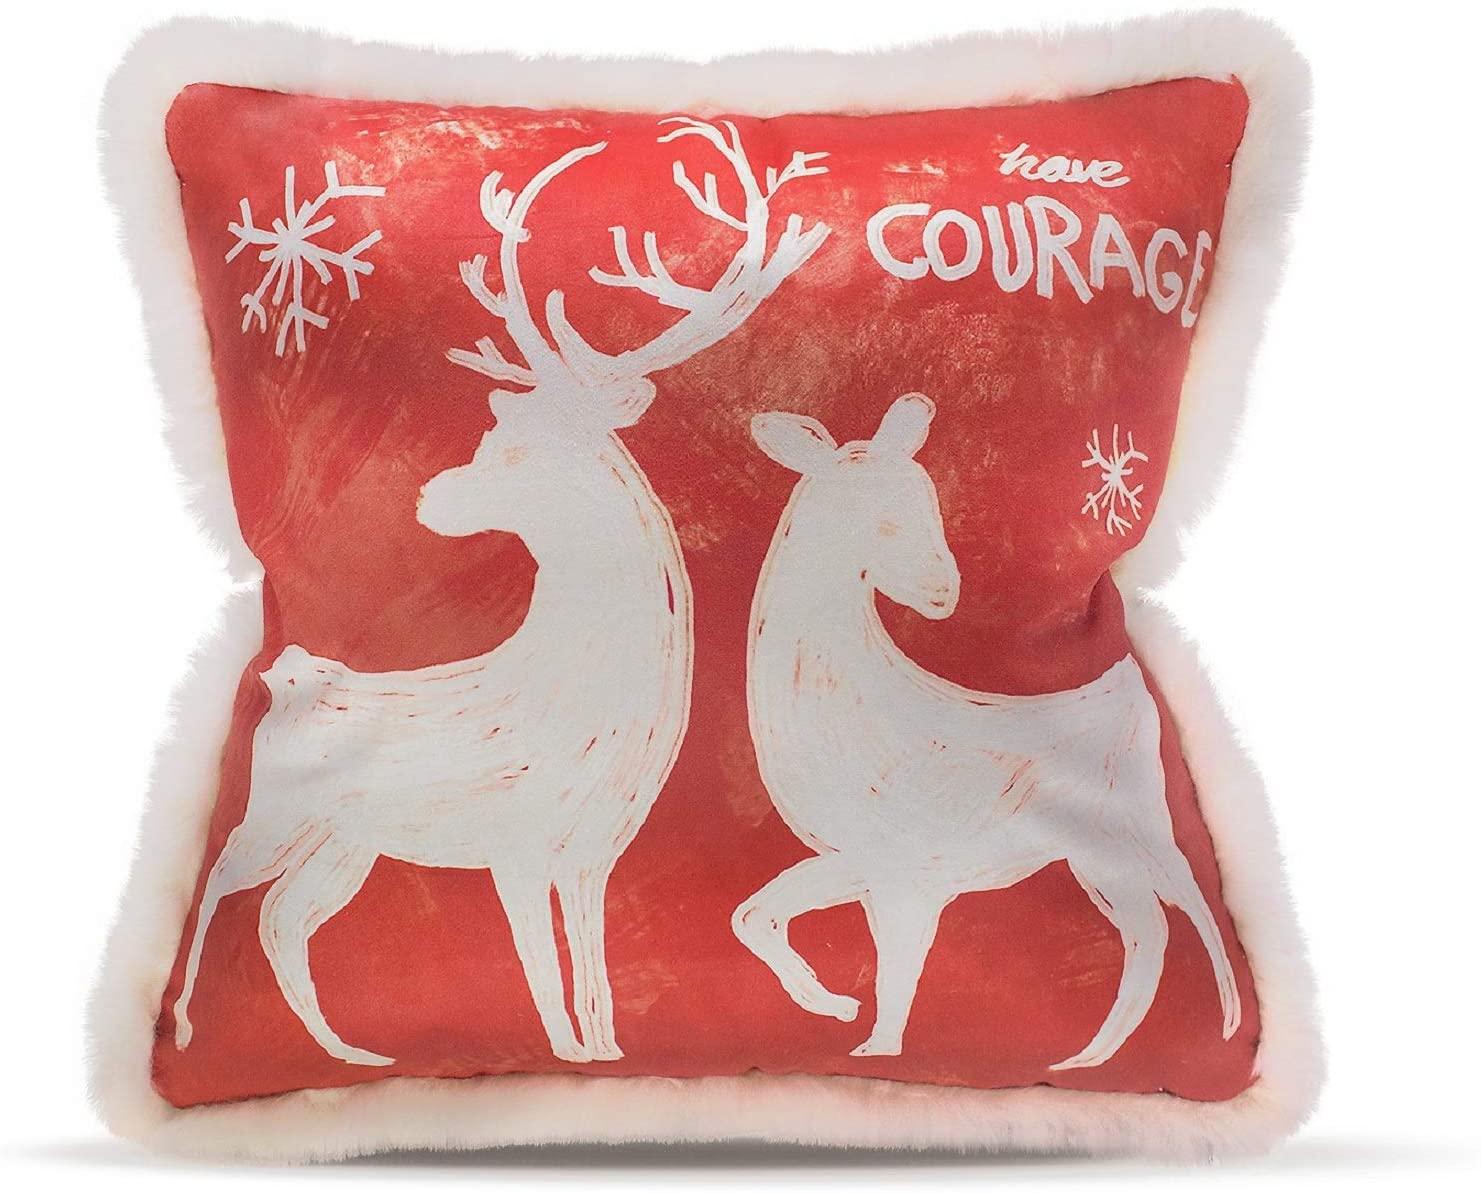 Moonsky Christmas Decorative Throw Pillow, 18